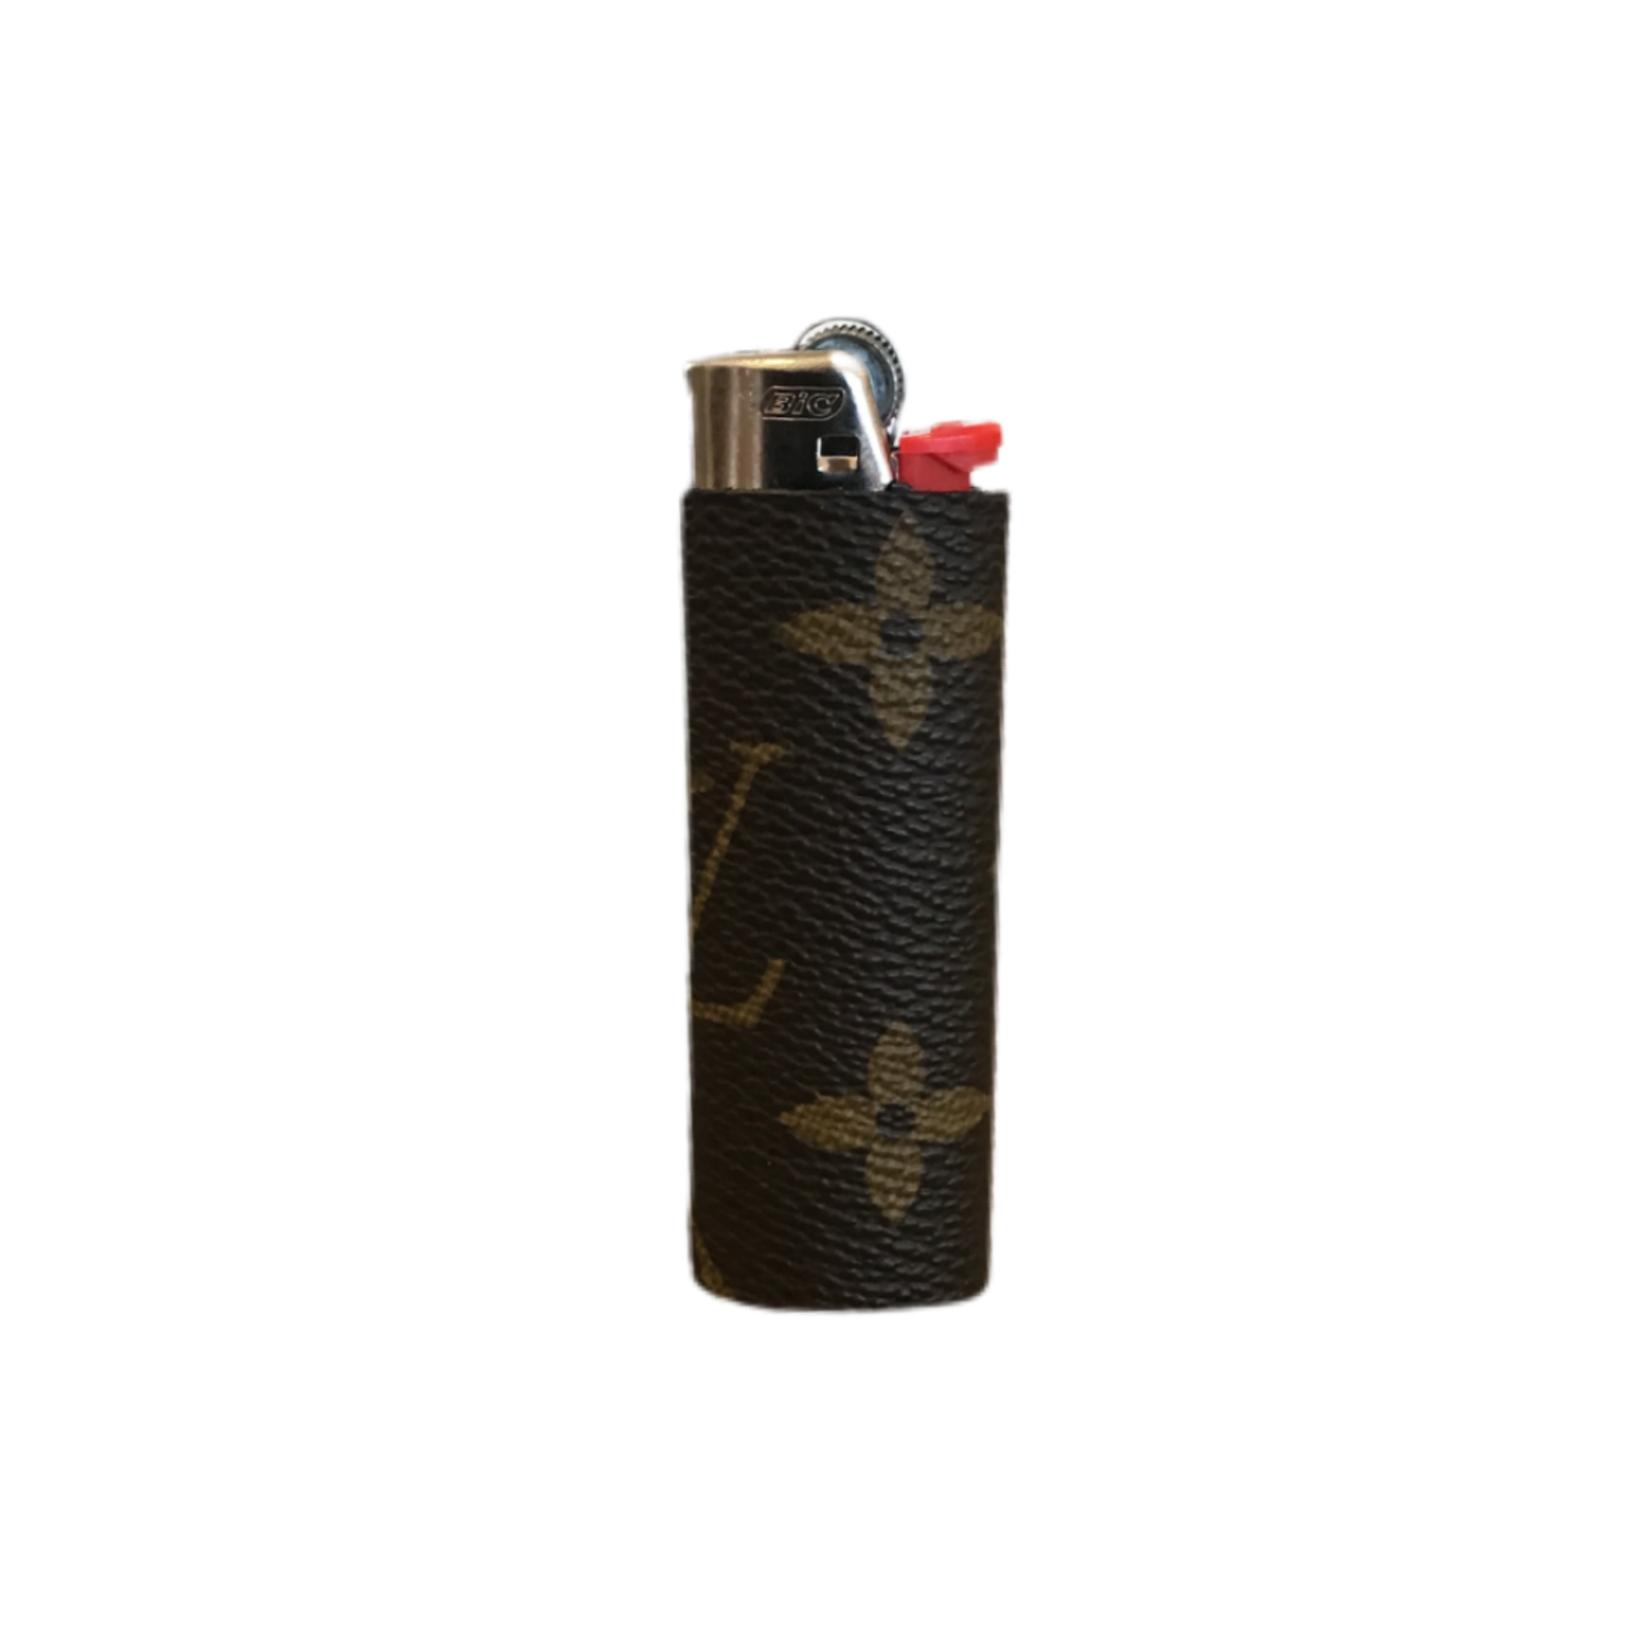 Sarah Coleman LV Brown Monogram Lighter